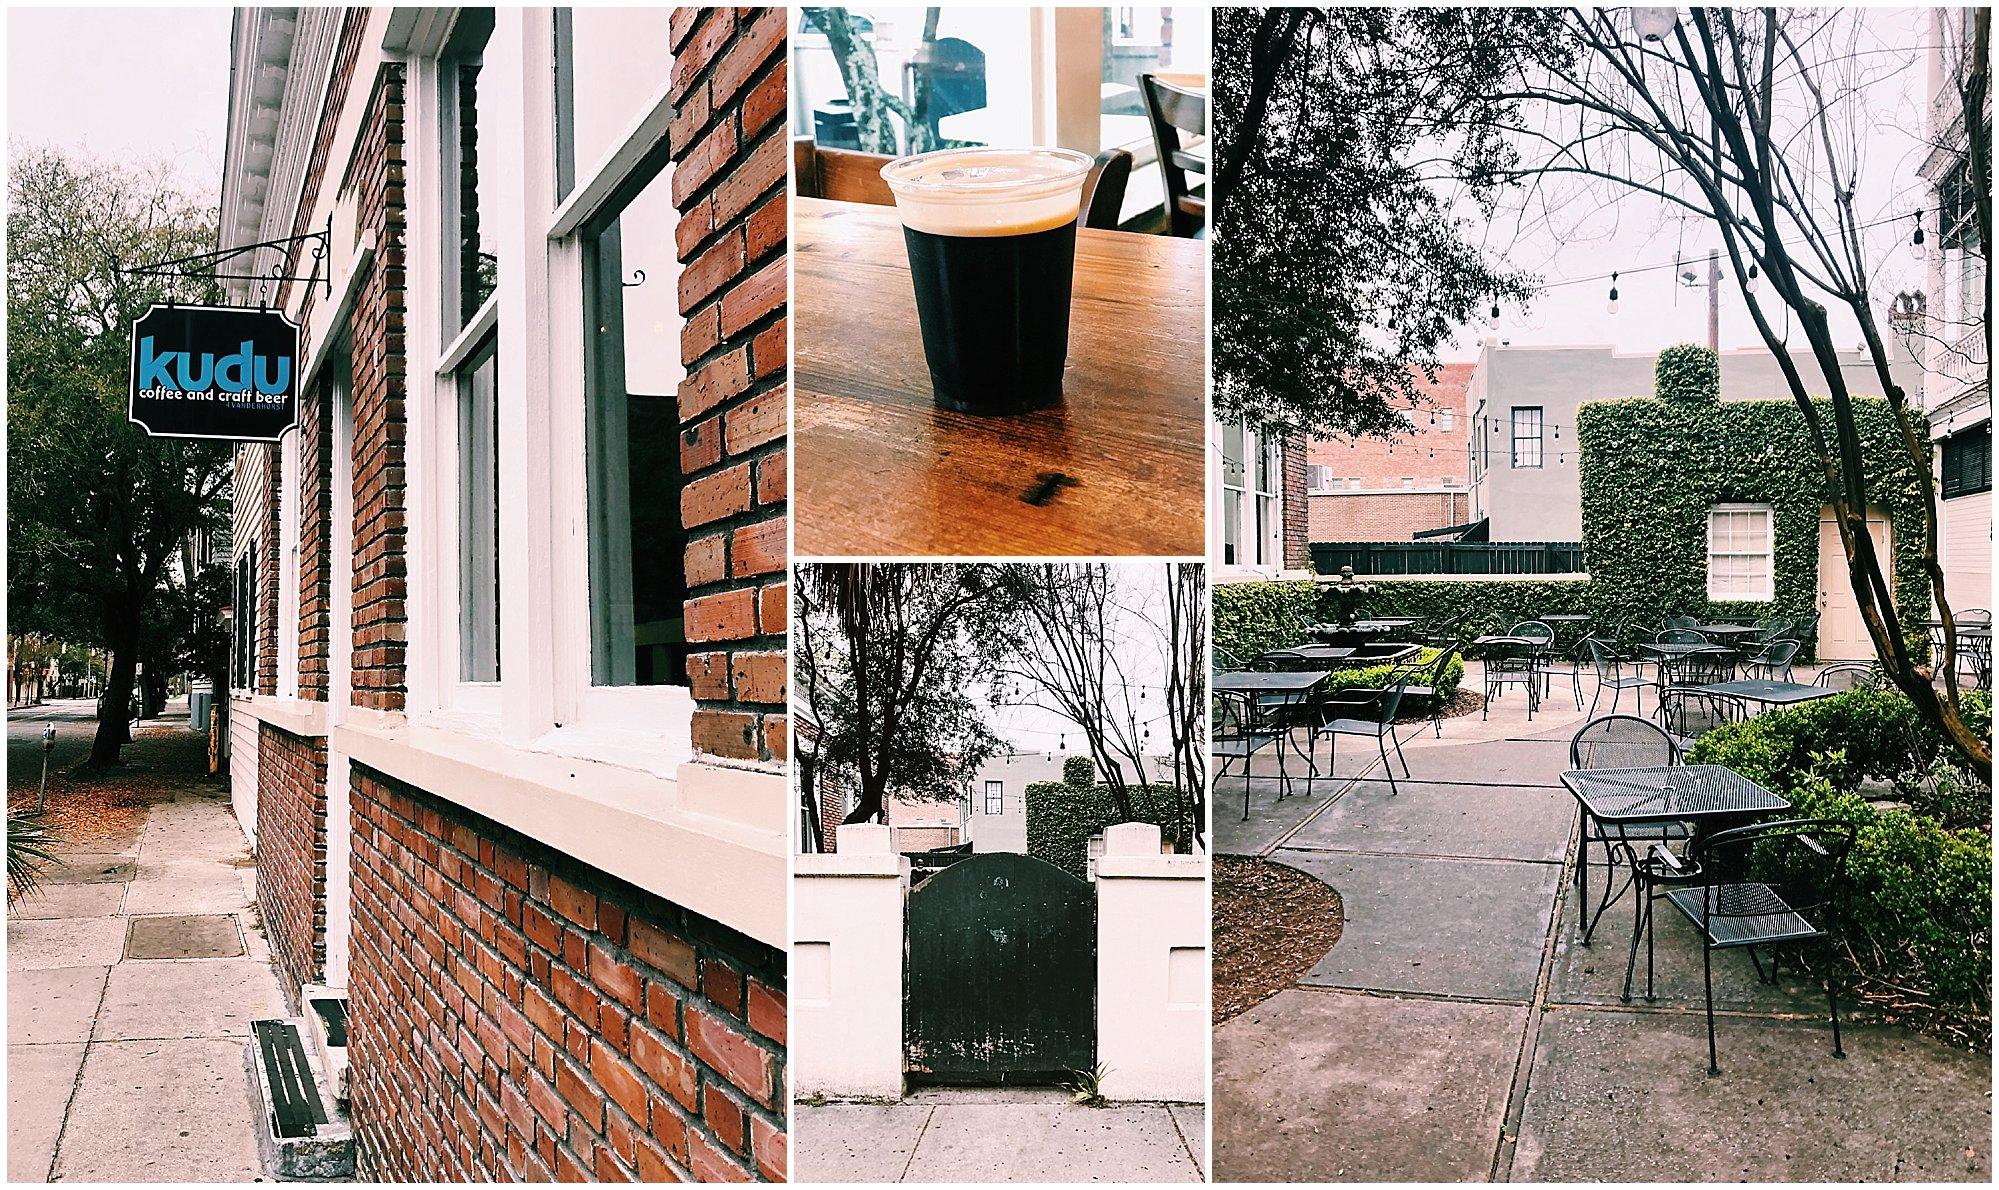 kudu coffee shop charleston